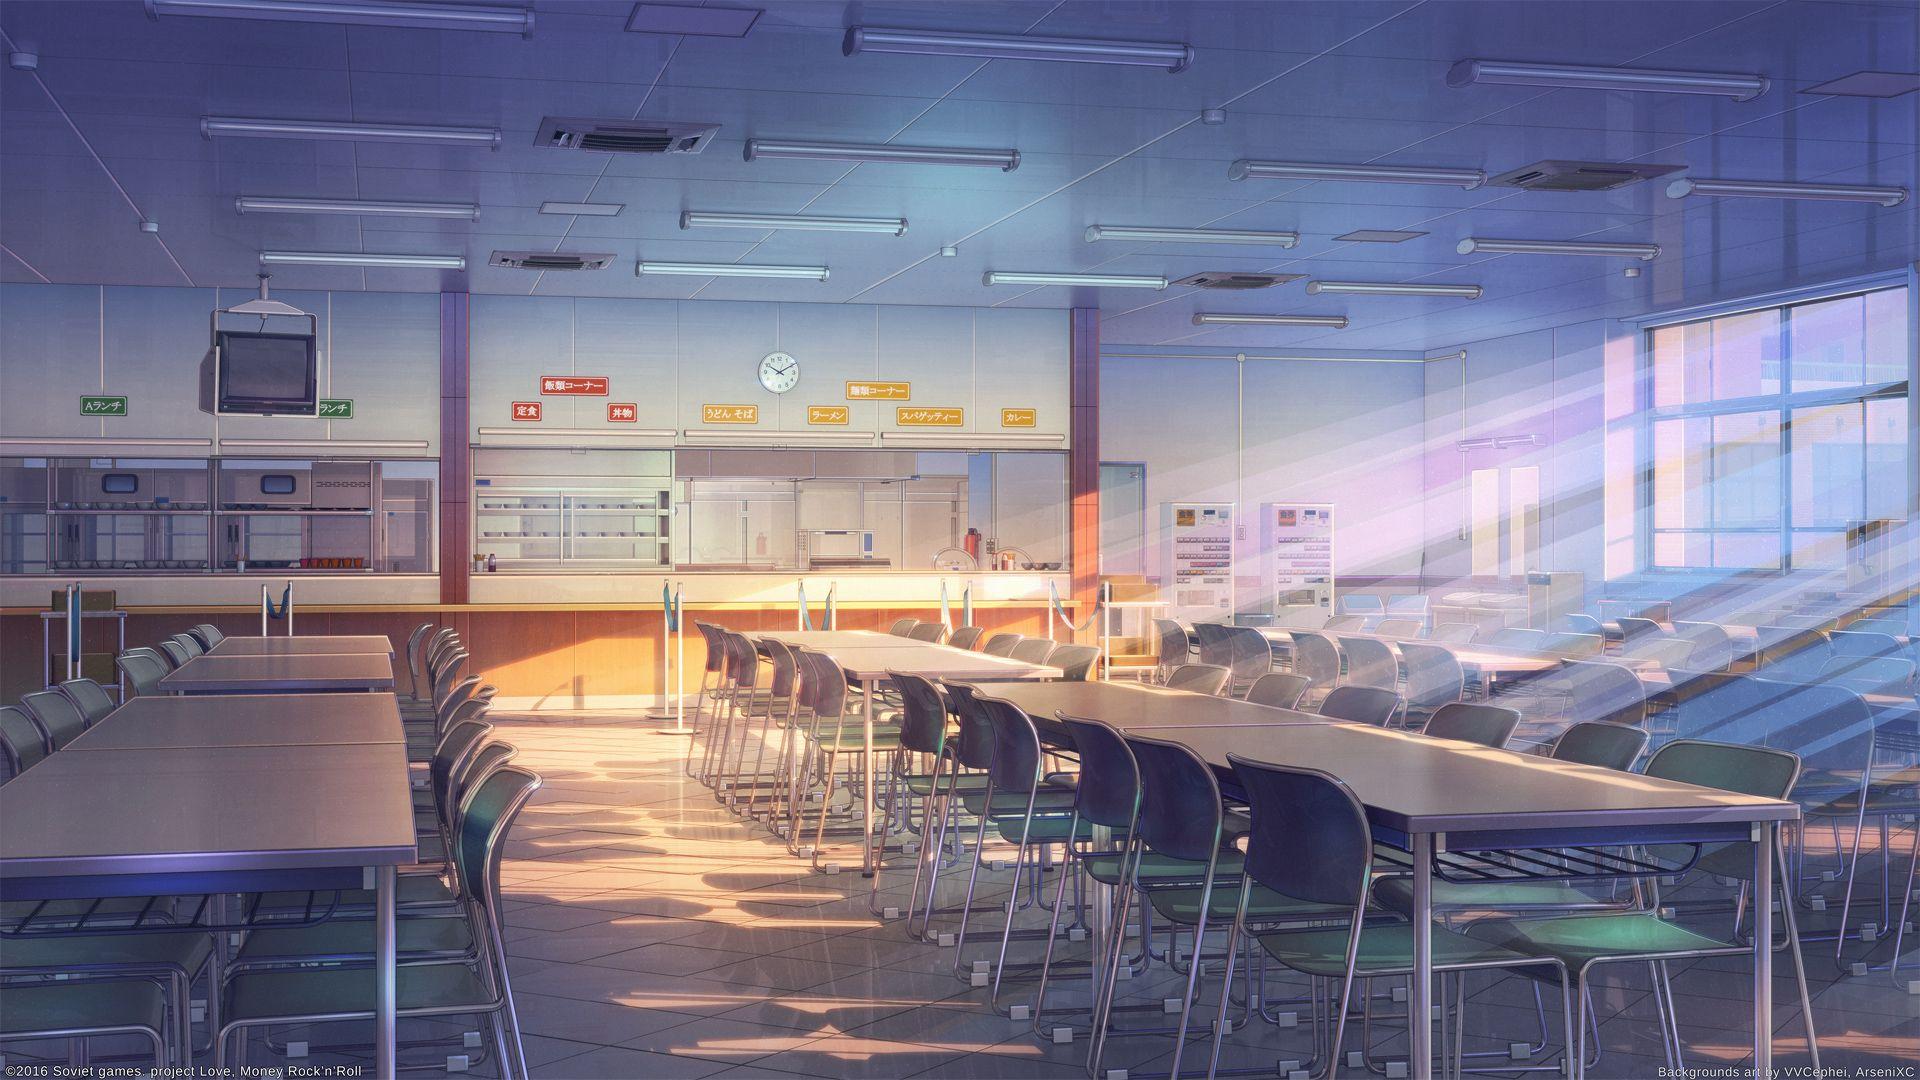 School cafeteria by arsenixc on DeviantArt アニメの風景, 学校